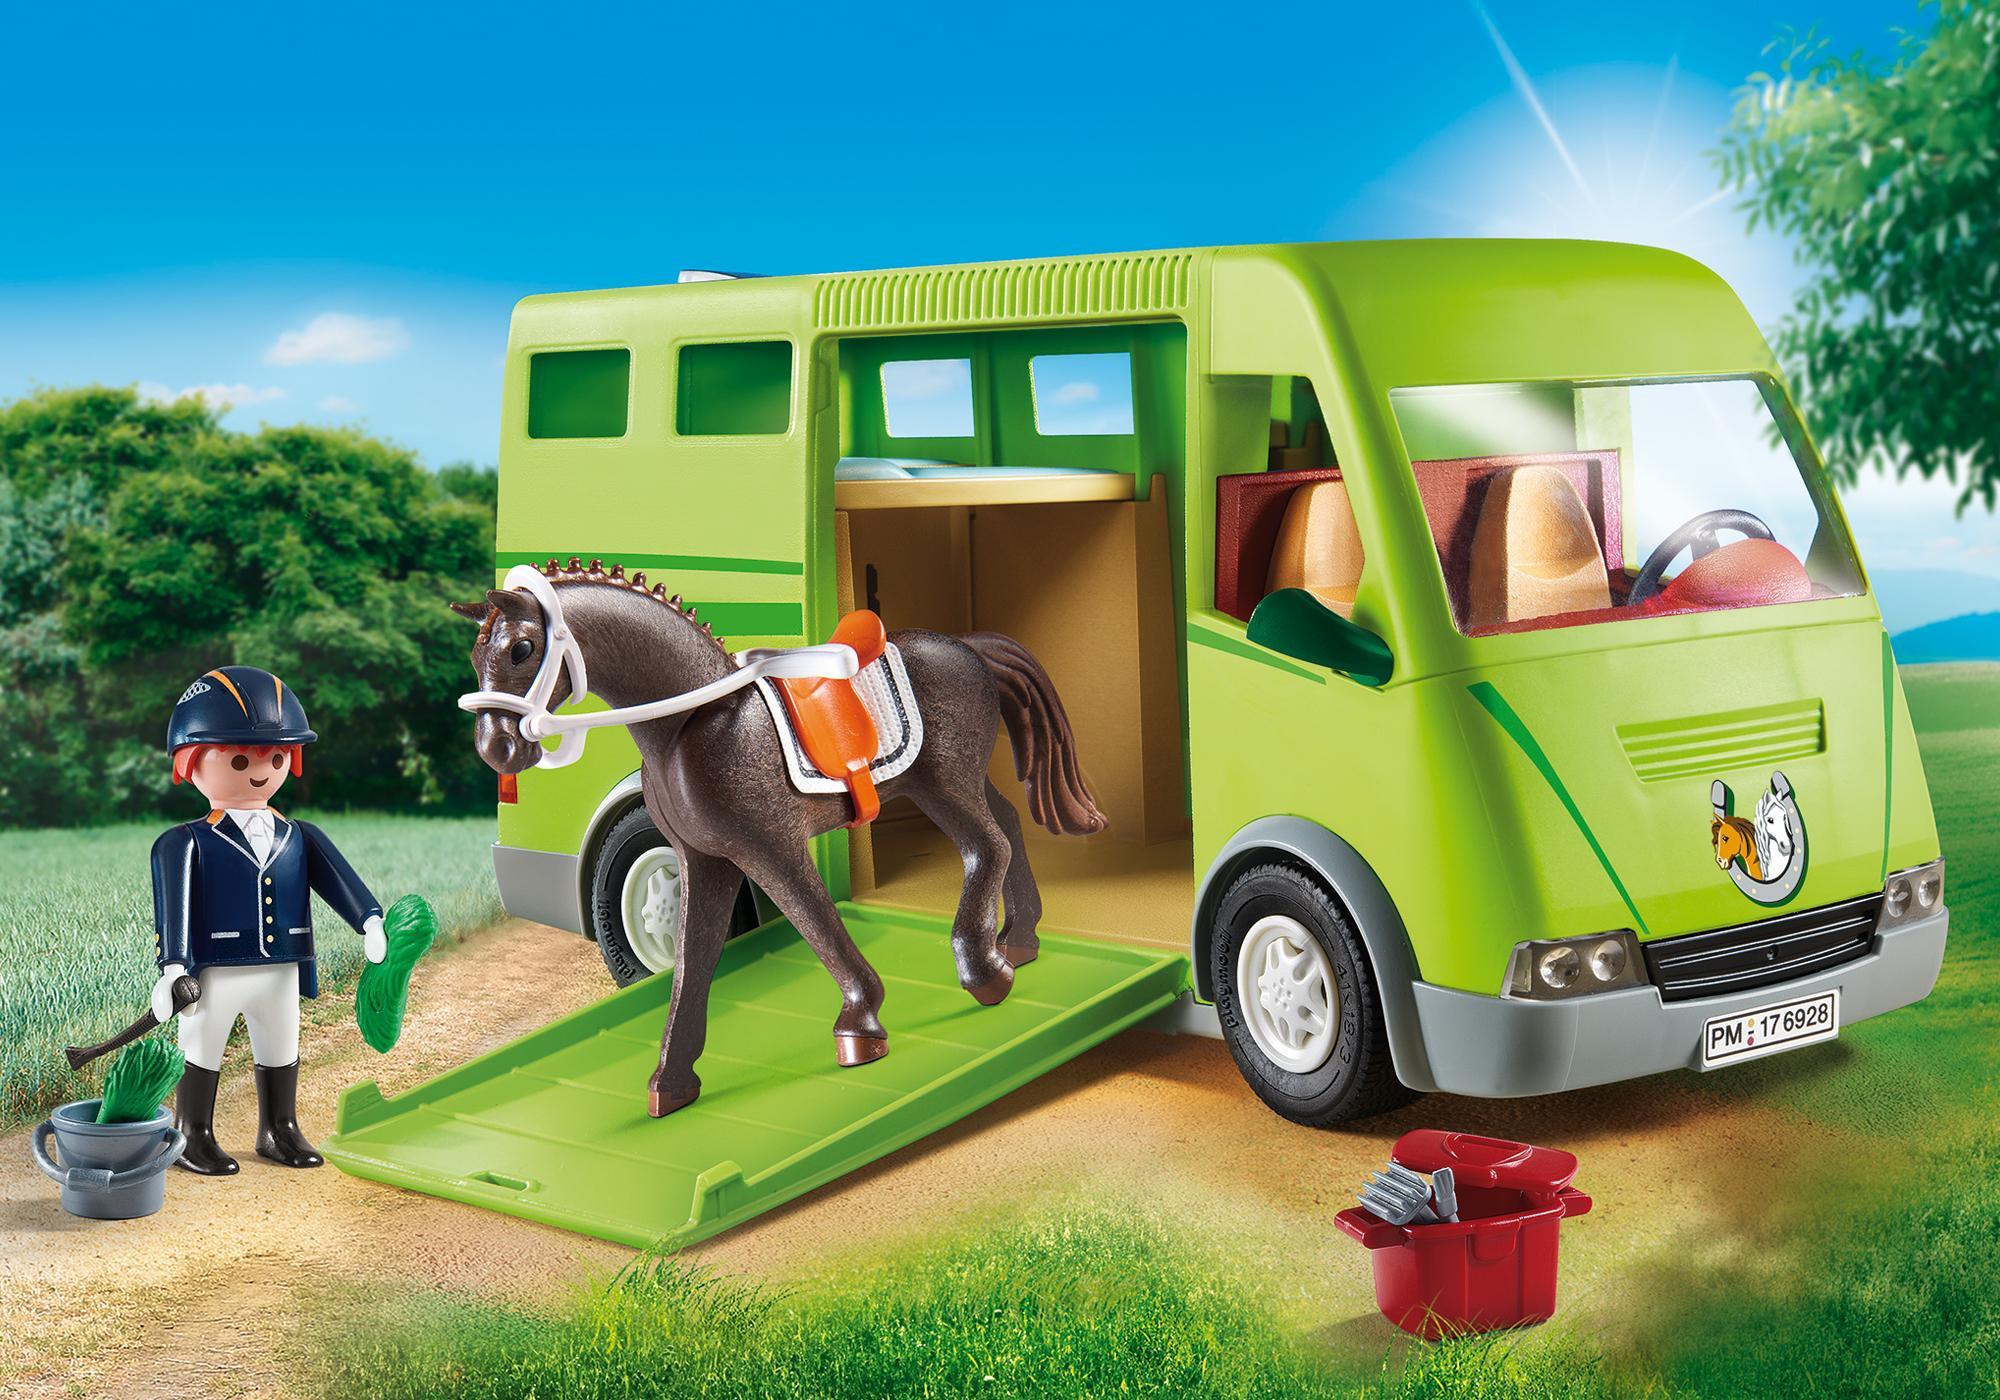 http://media.playmobil.com/i/playmobil/6928_product_detail/Cavalier avec van et cheval